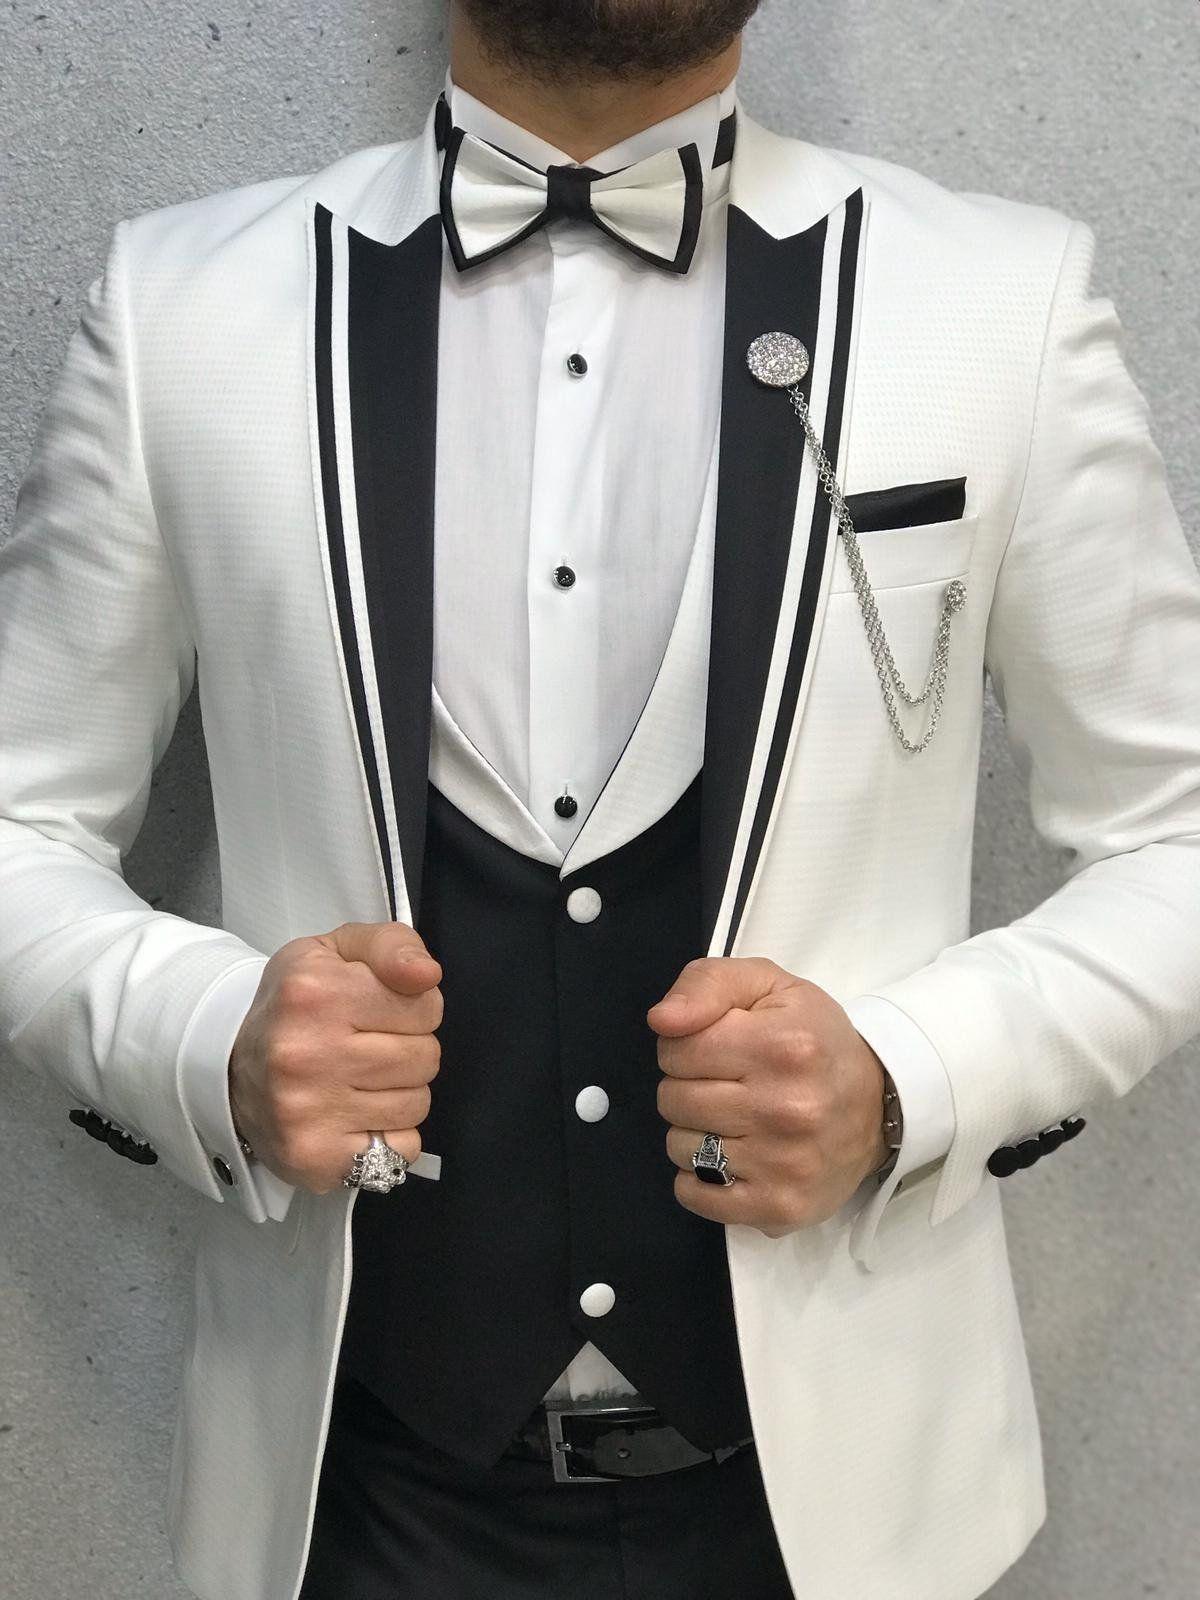 Infinite White Tuxedo with Black Vest in 2020 Slim fit